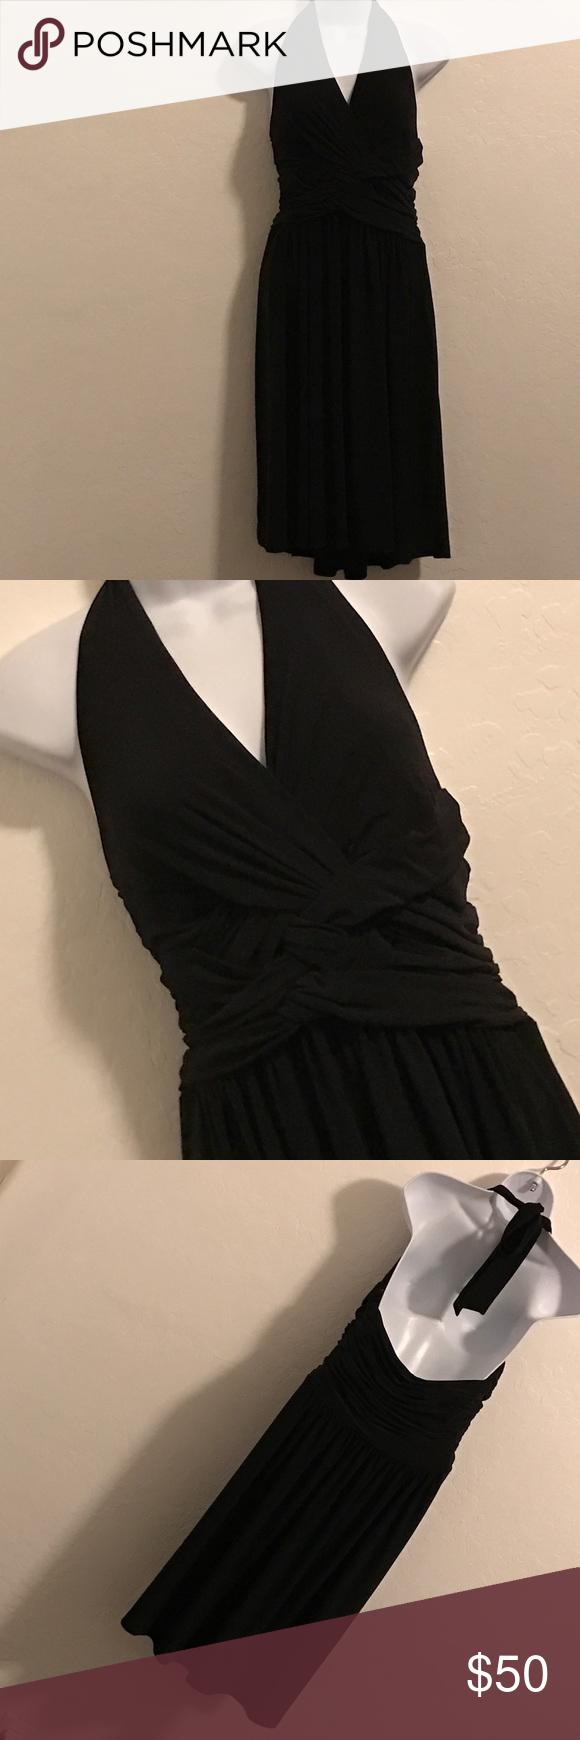 🆕 (PLUS) Jones New York Black Halter Dress